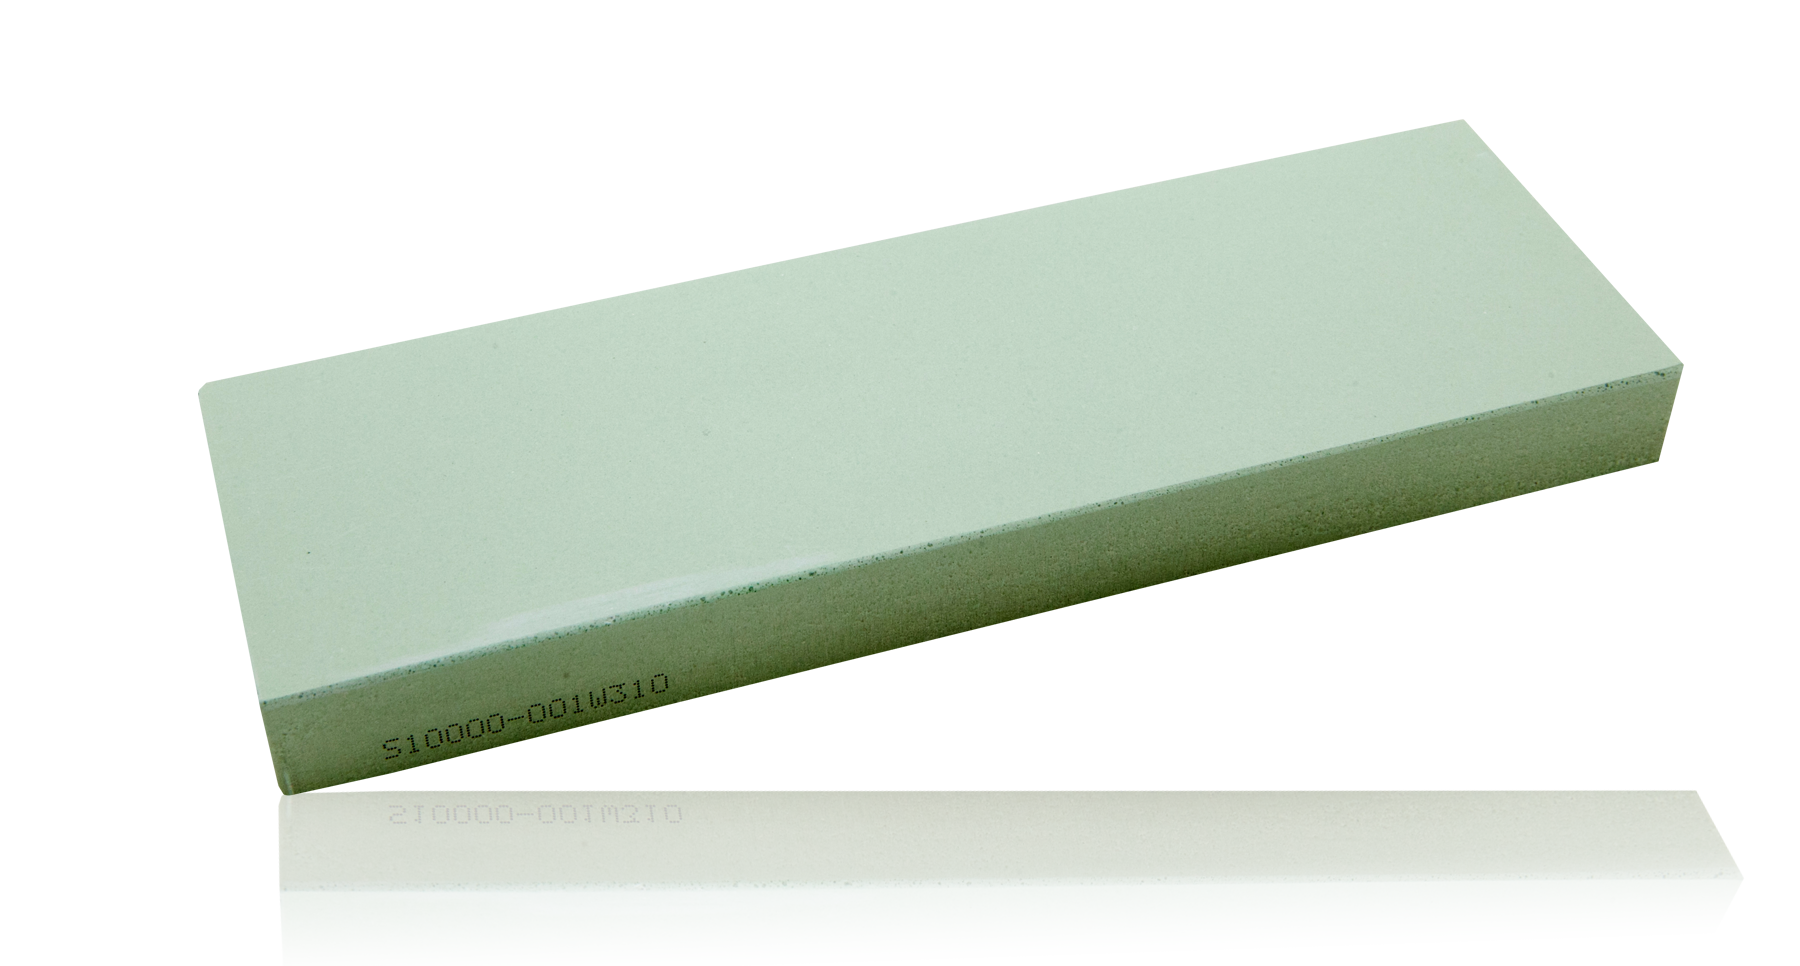 Камень точильный Naniwa S-490.